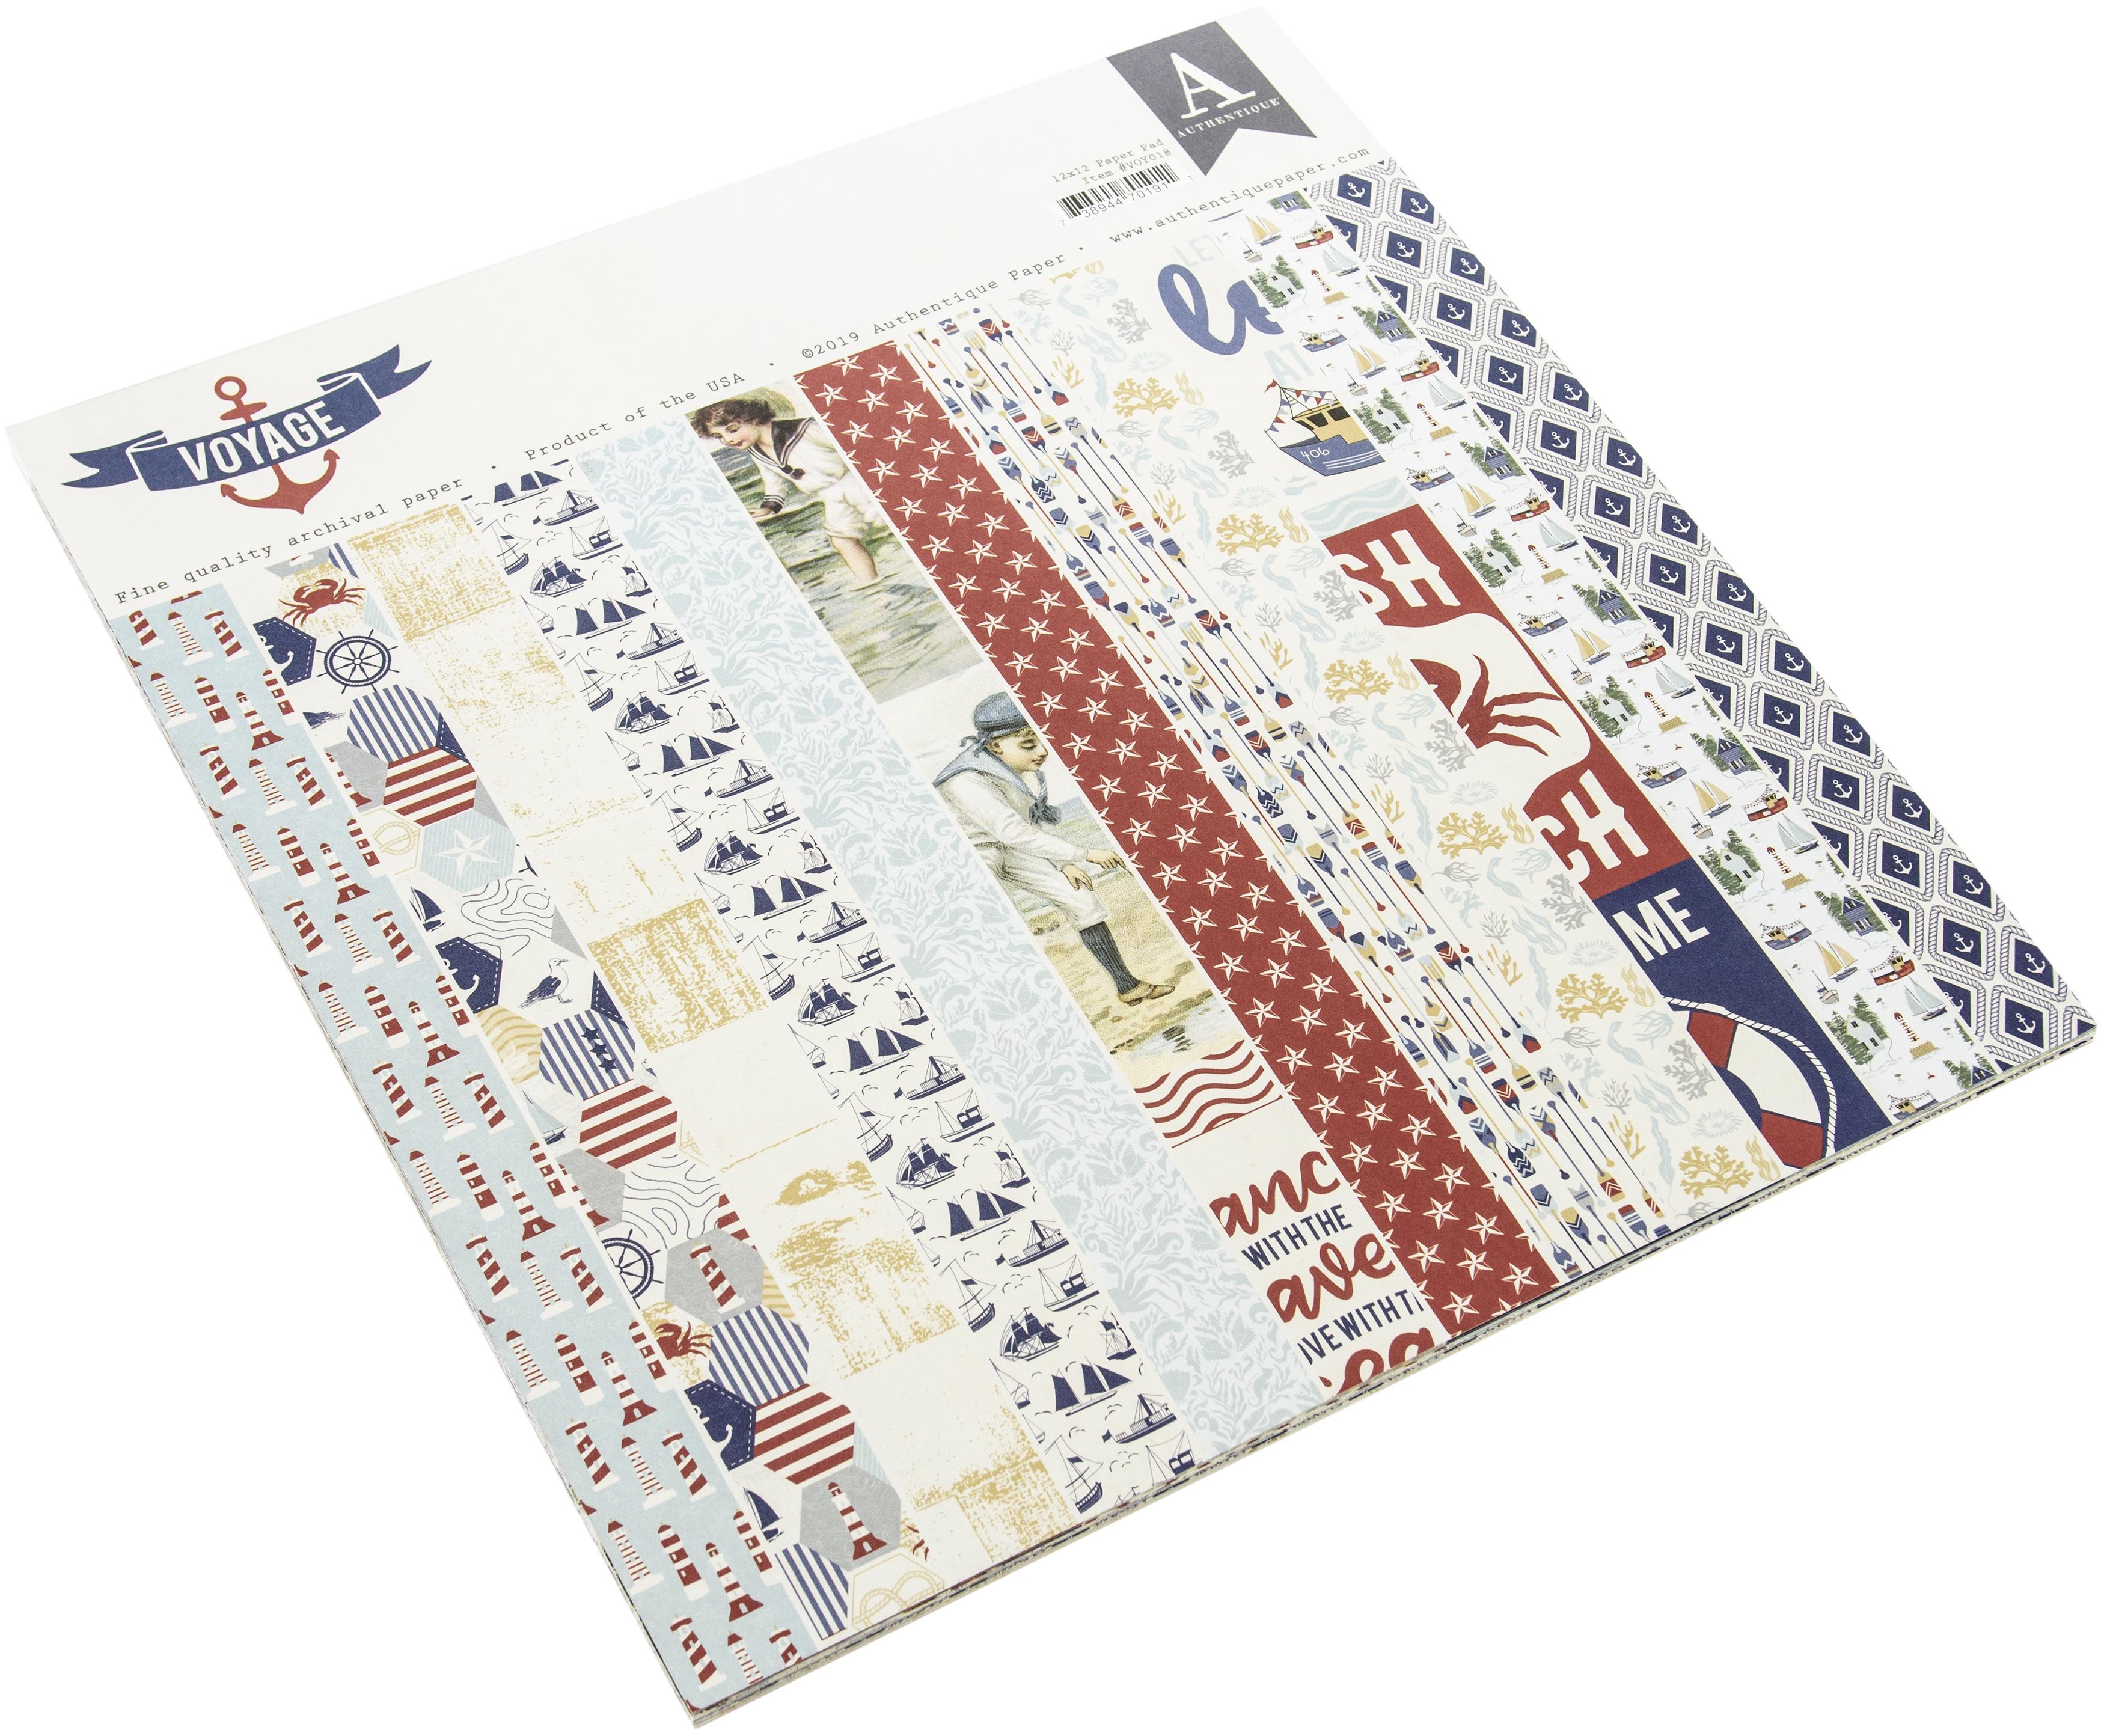 Authentique Double-Sided Cardstock Pad 12X12 24/Pkg-Voyage